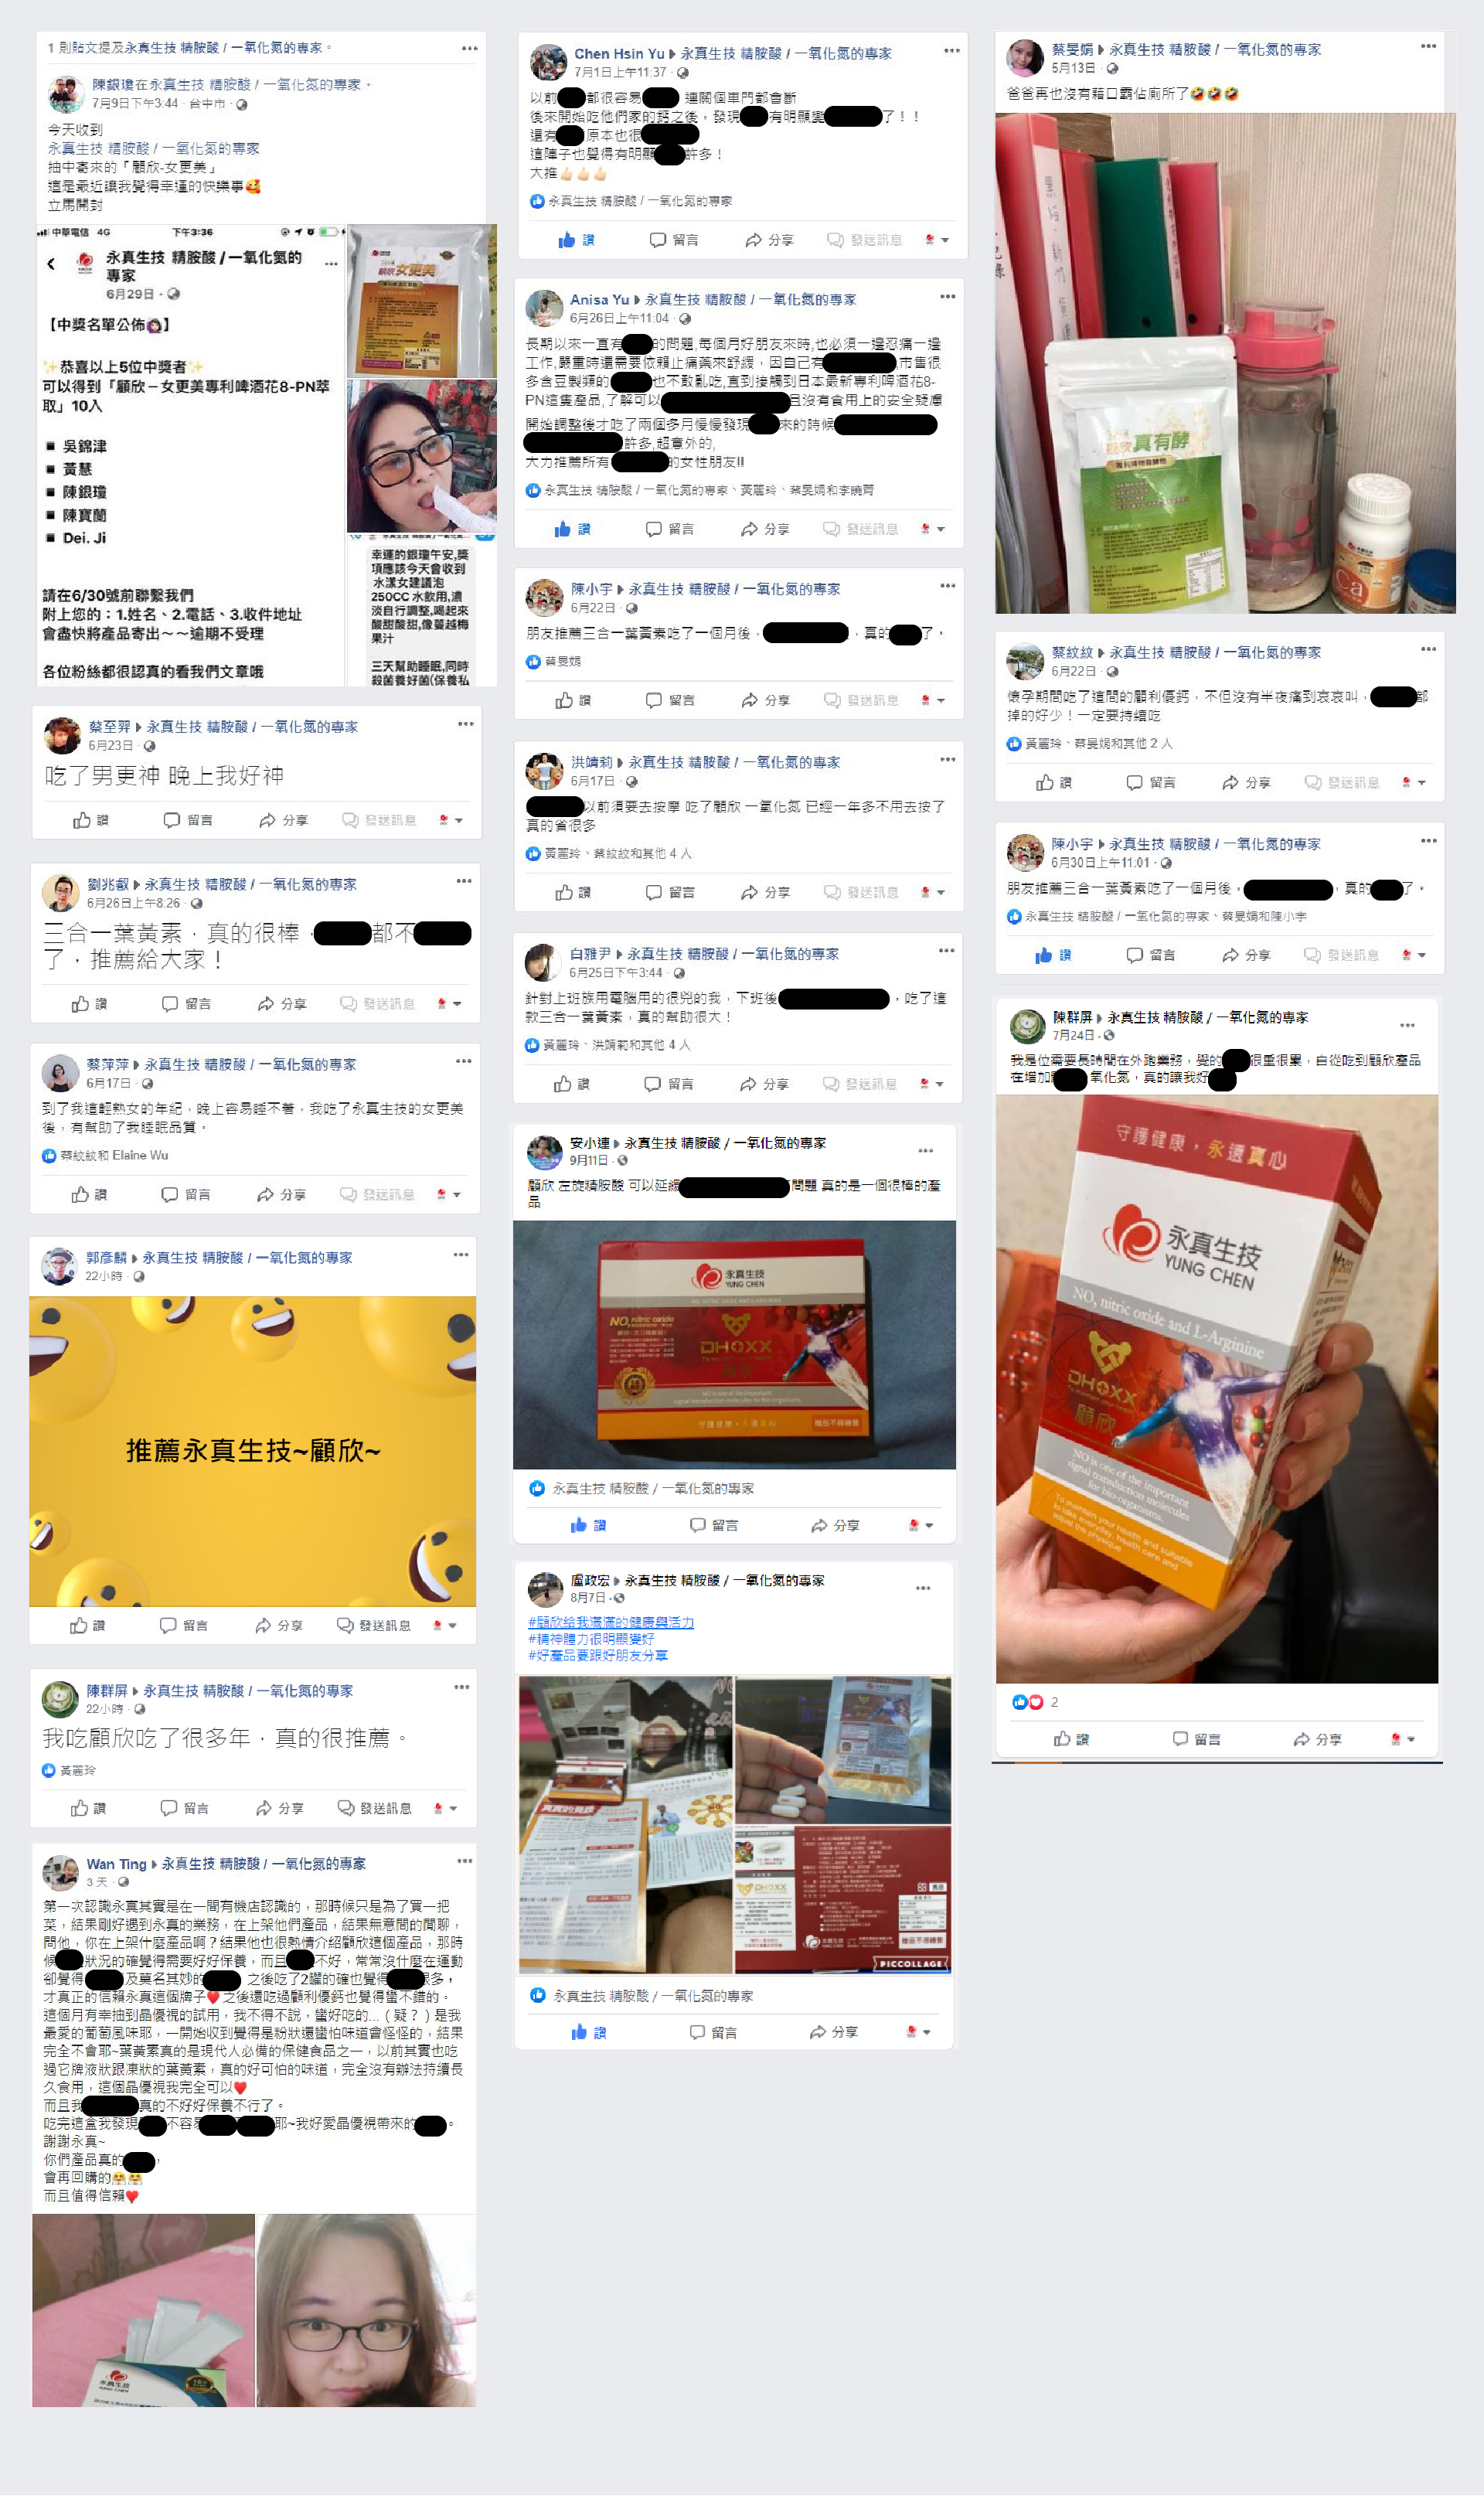 Facebook 消費者推薦,拿好禮